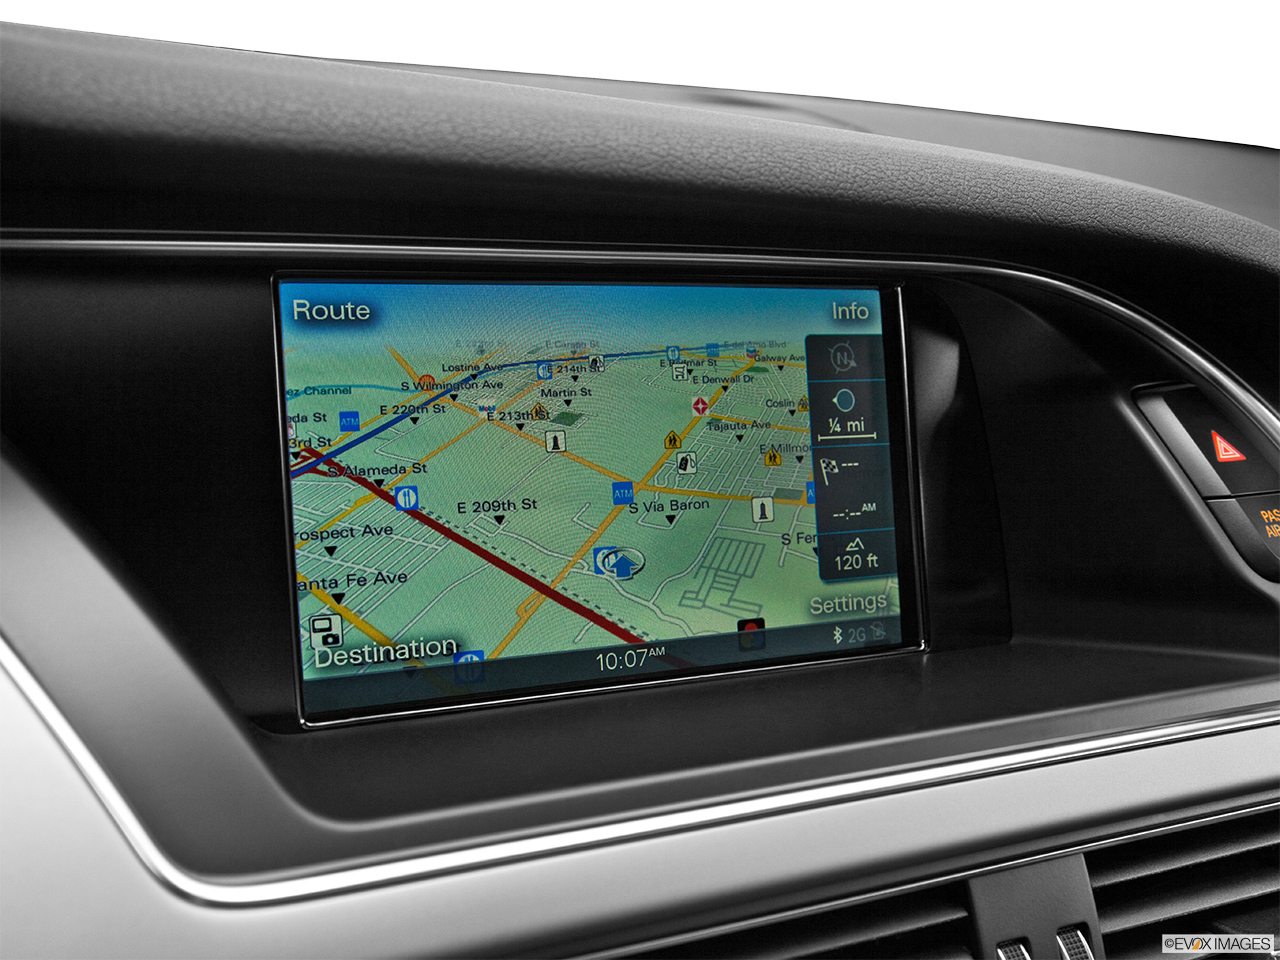 audi gps manual rh audi gps manual dohbots de Nav Systems Inc Best Car Nav Systems